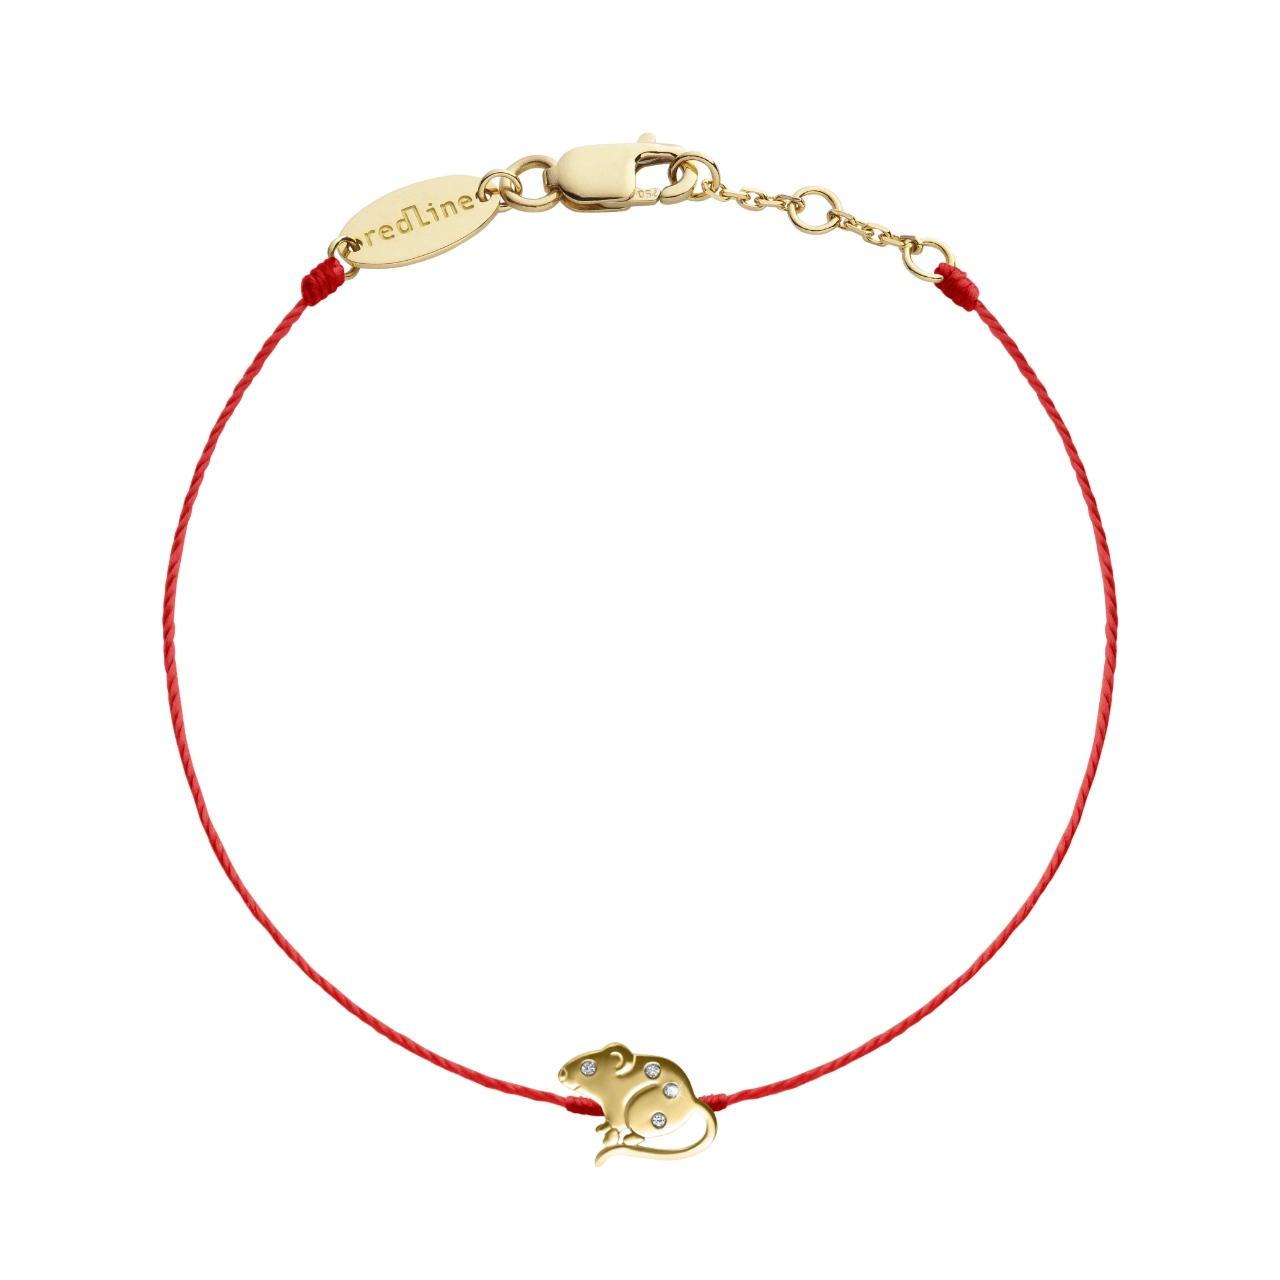 Lucky Mouse鼠來寶(幸運鼠) 黃K金全紅線手繩